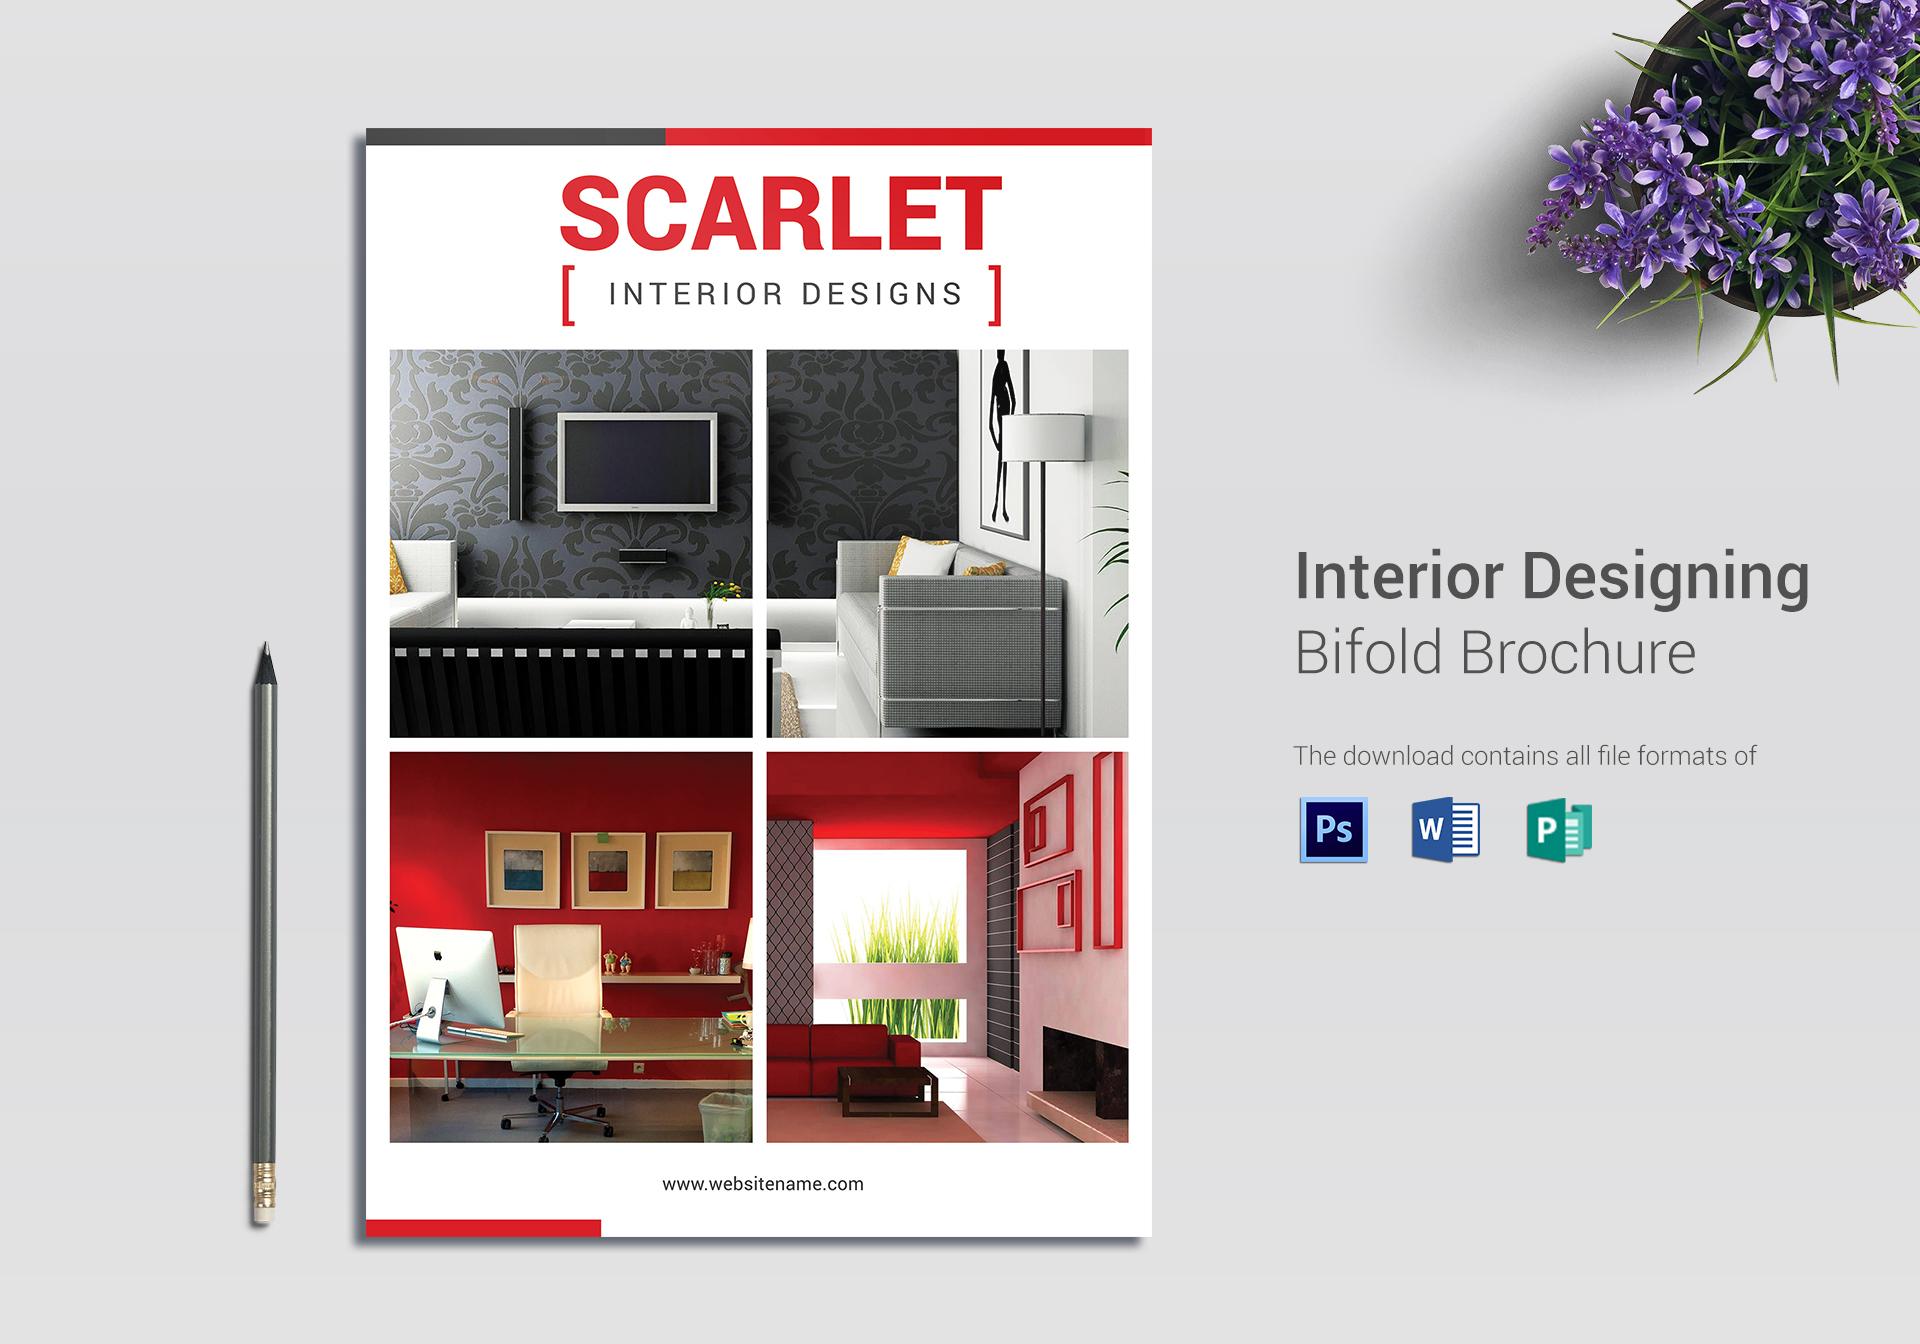 bifold interior designing brochure